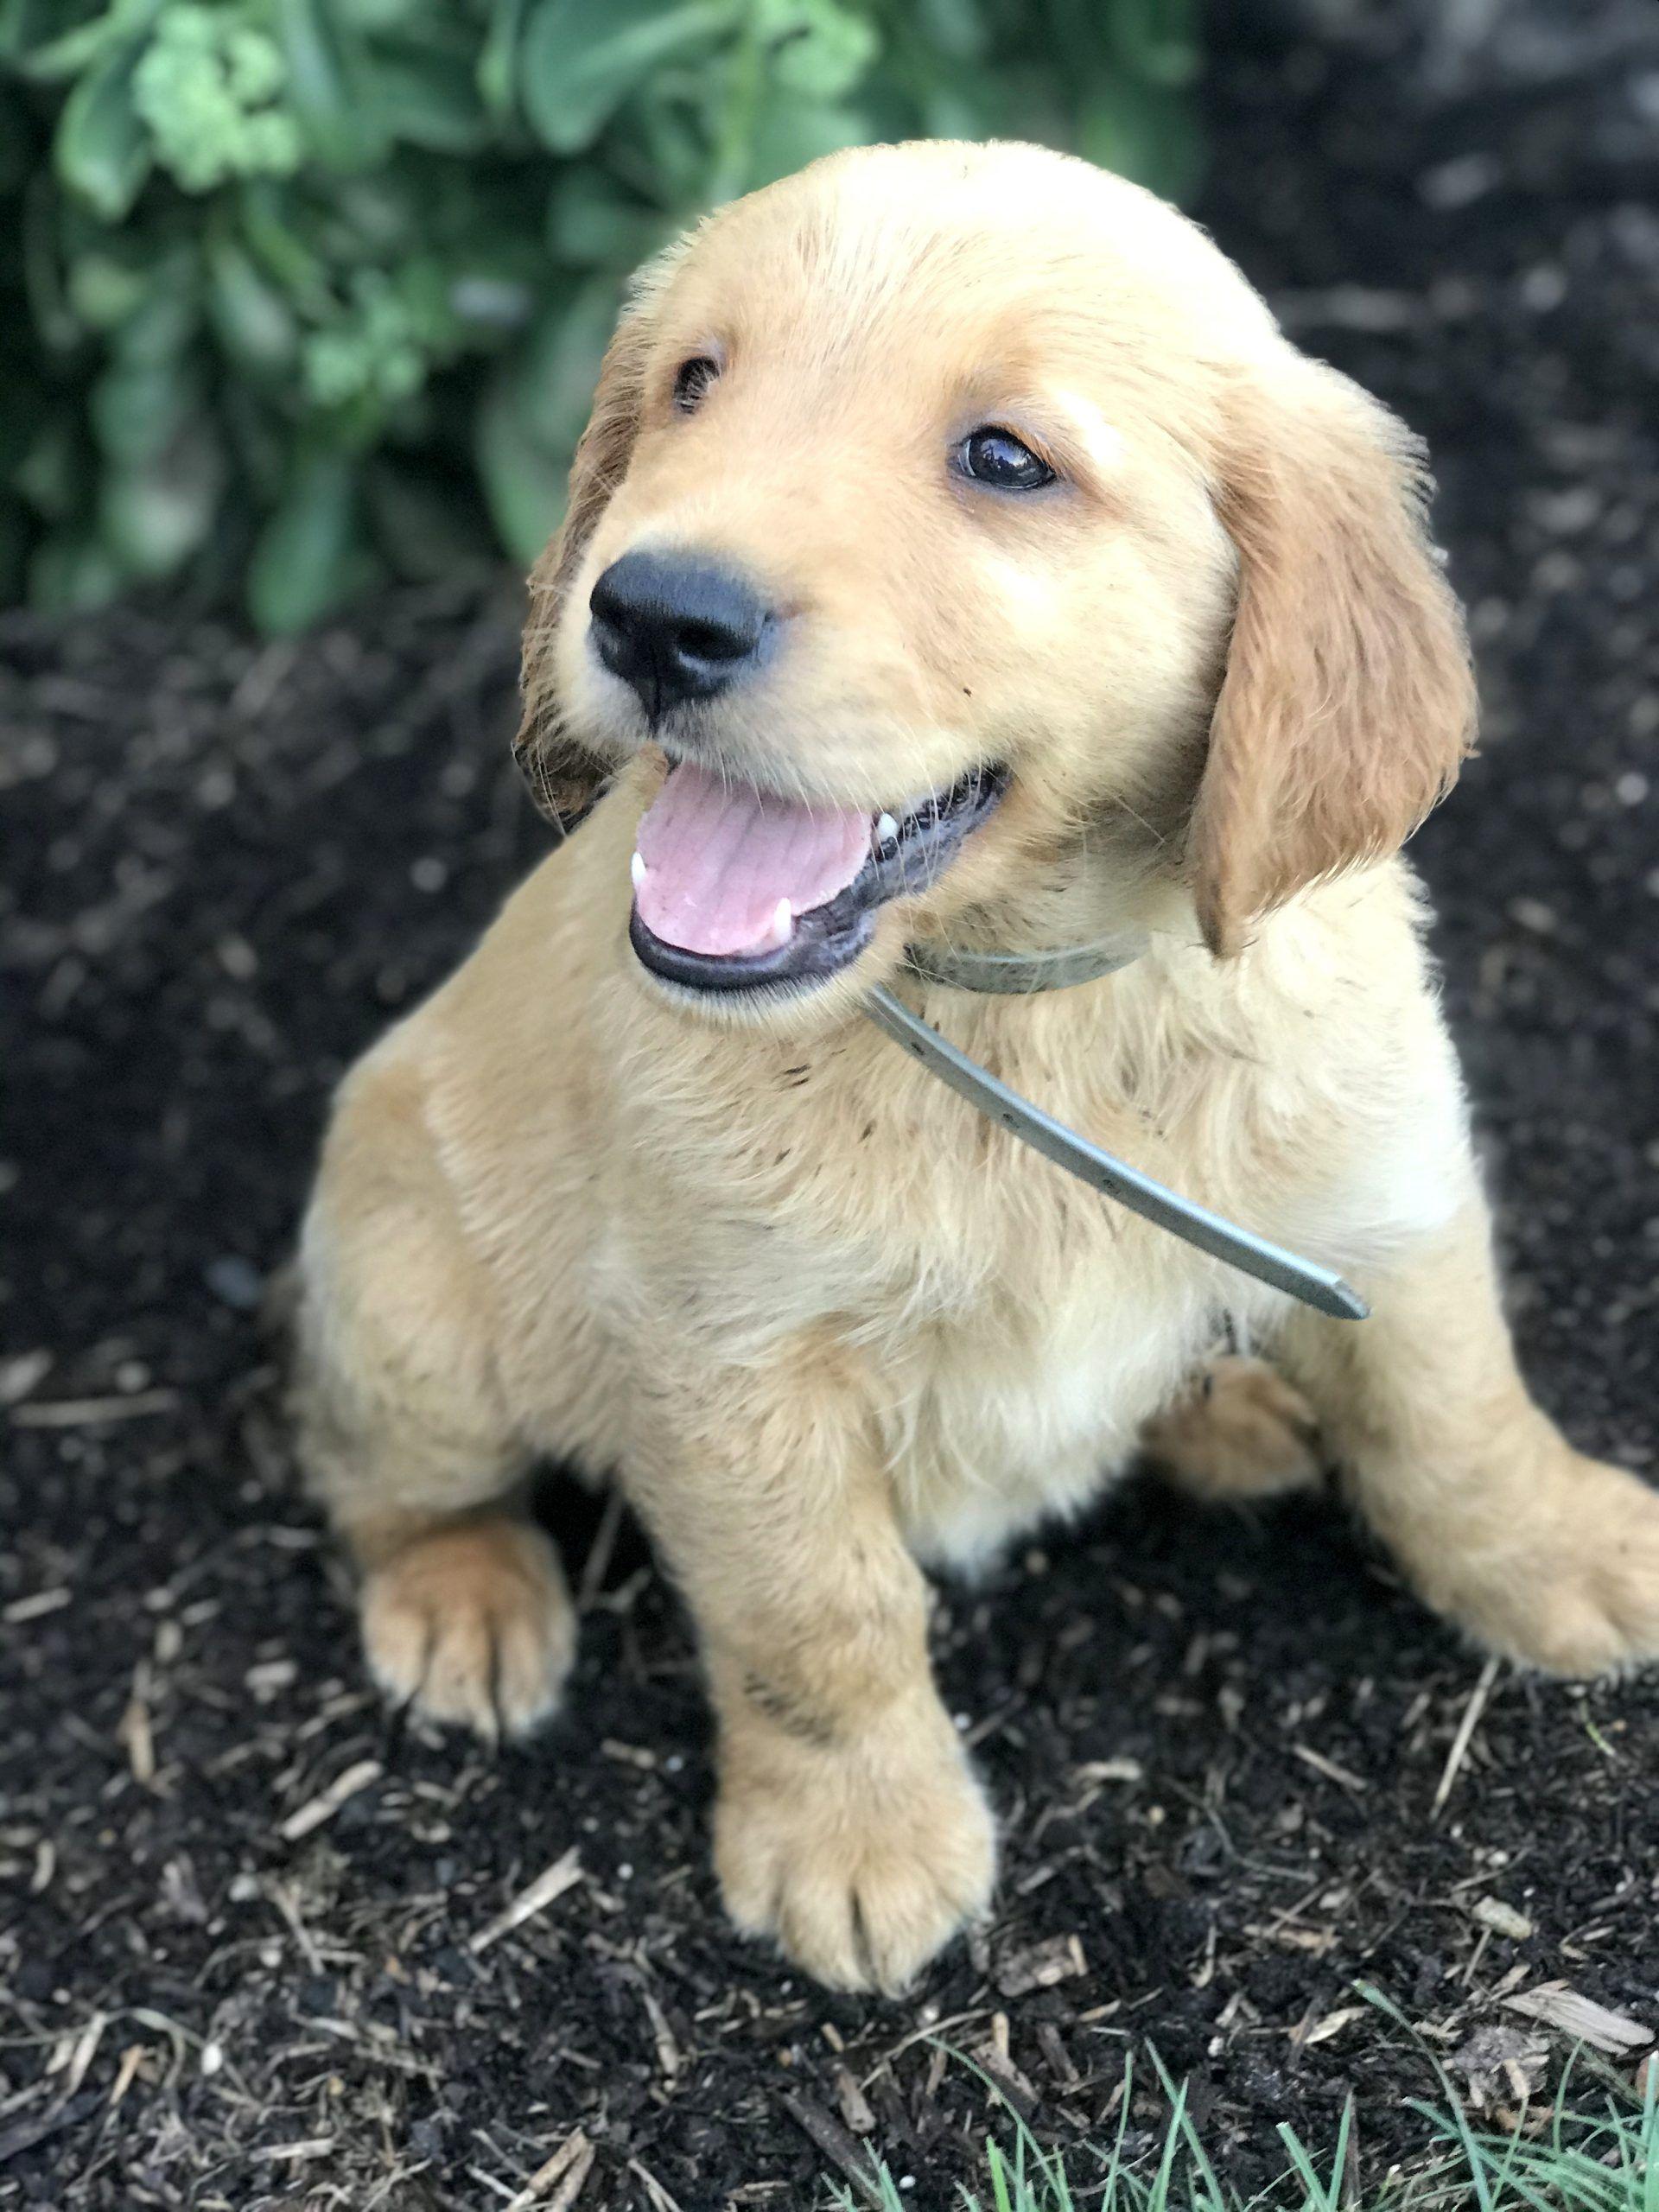 Felix Male Golden Retriever Puppy In 2020 Golden Retriever Golden Retriever Puppy Puppies